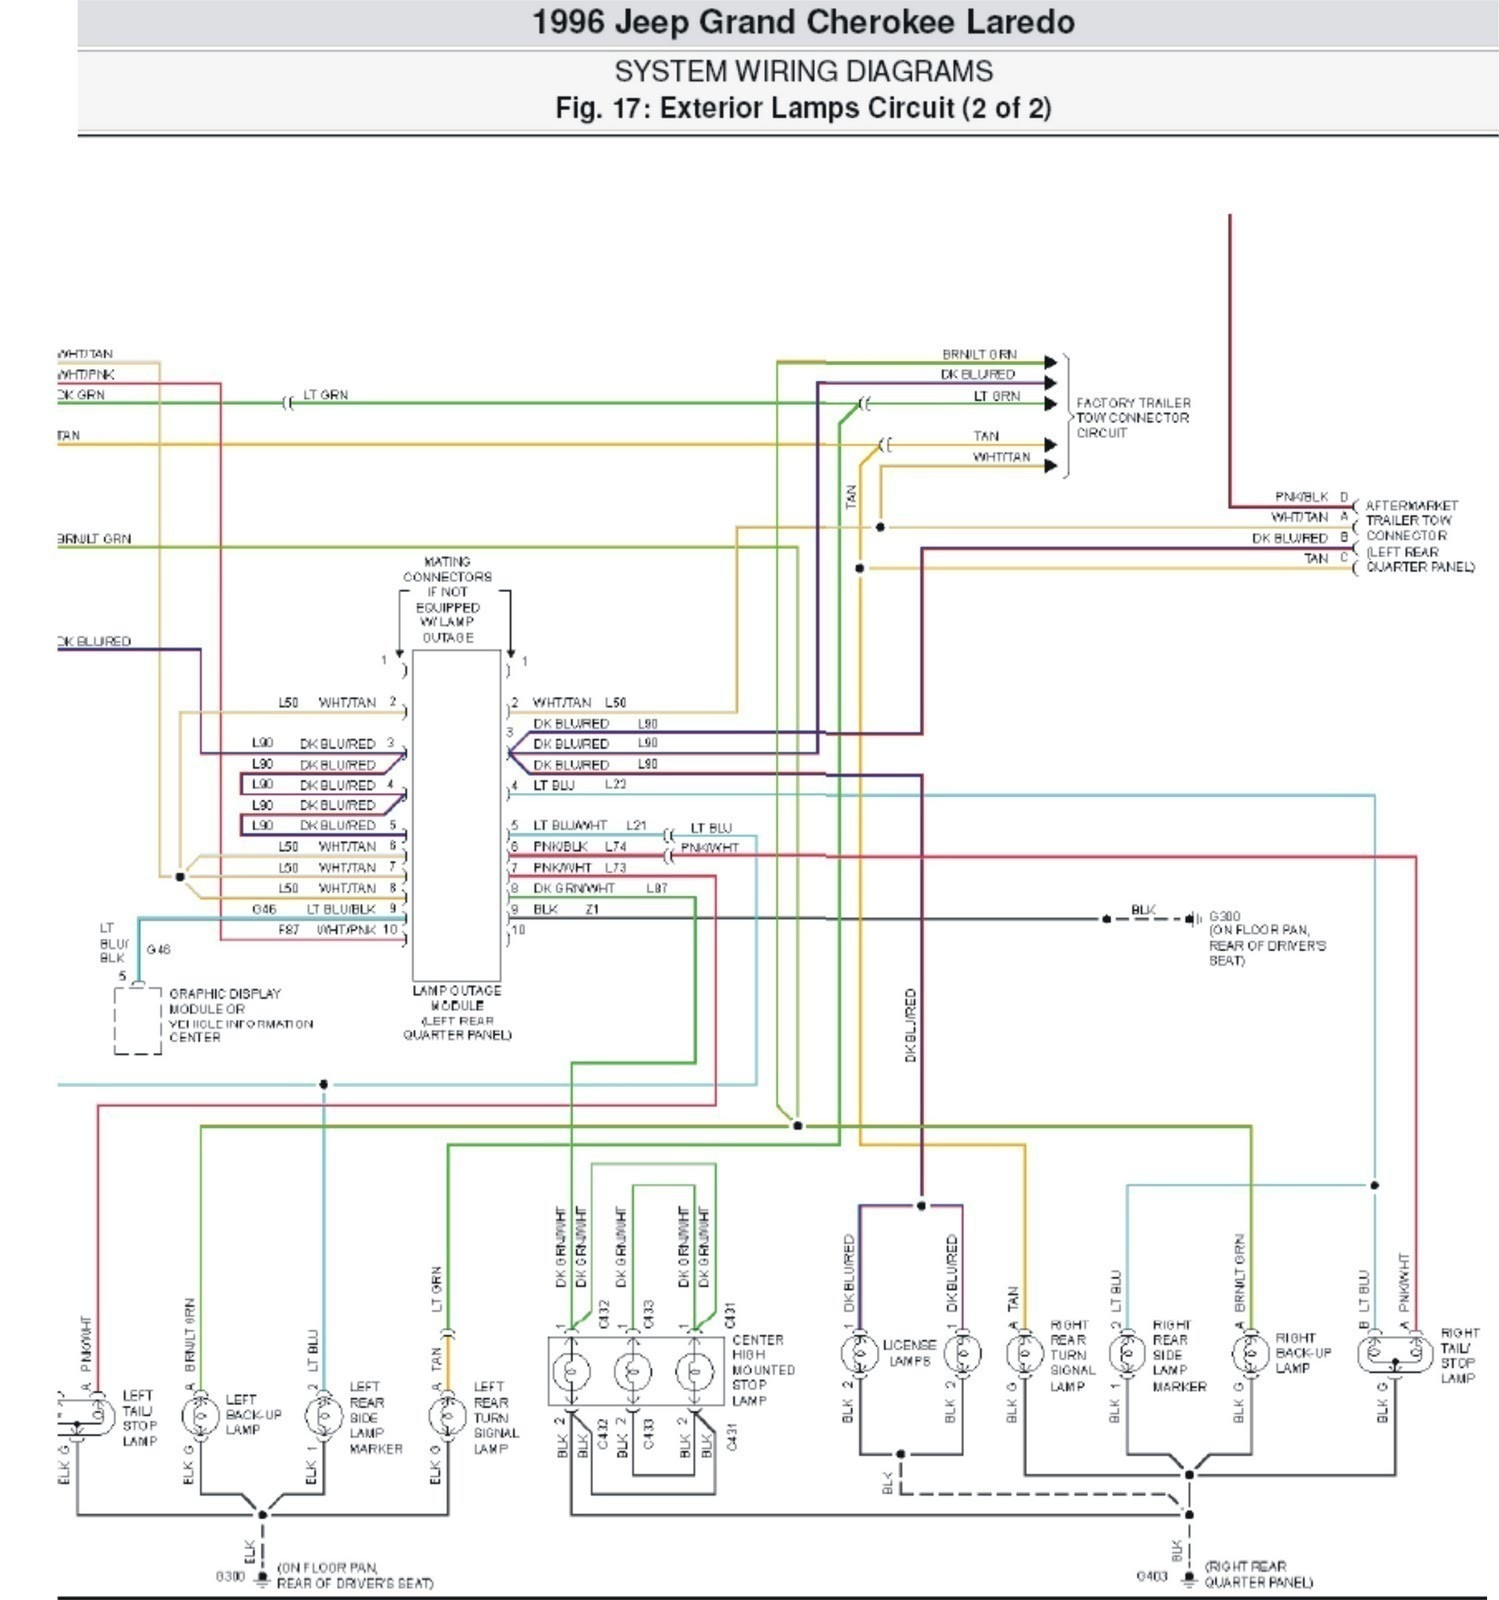 1999 jeep grand cherokee radio wiring diagram Collection-Wiring Diagram 2000 Jeep Grand Cherokee Laredo Fresh Radio Wiring Diagram Jeep Cherokee Fresh Xj Radio 8-t